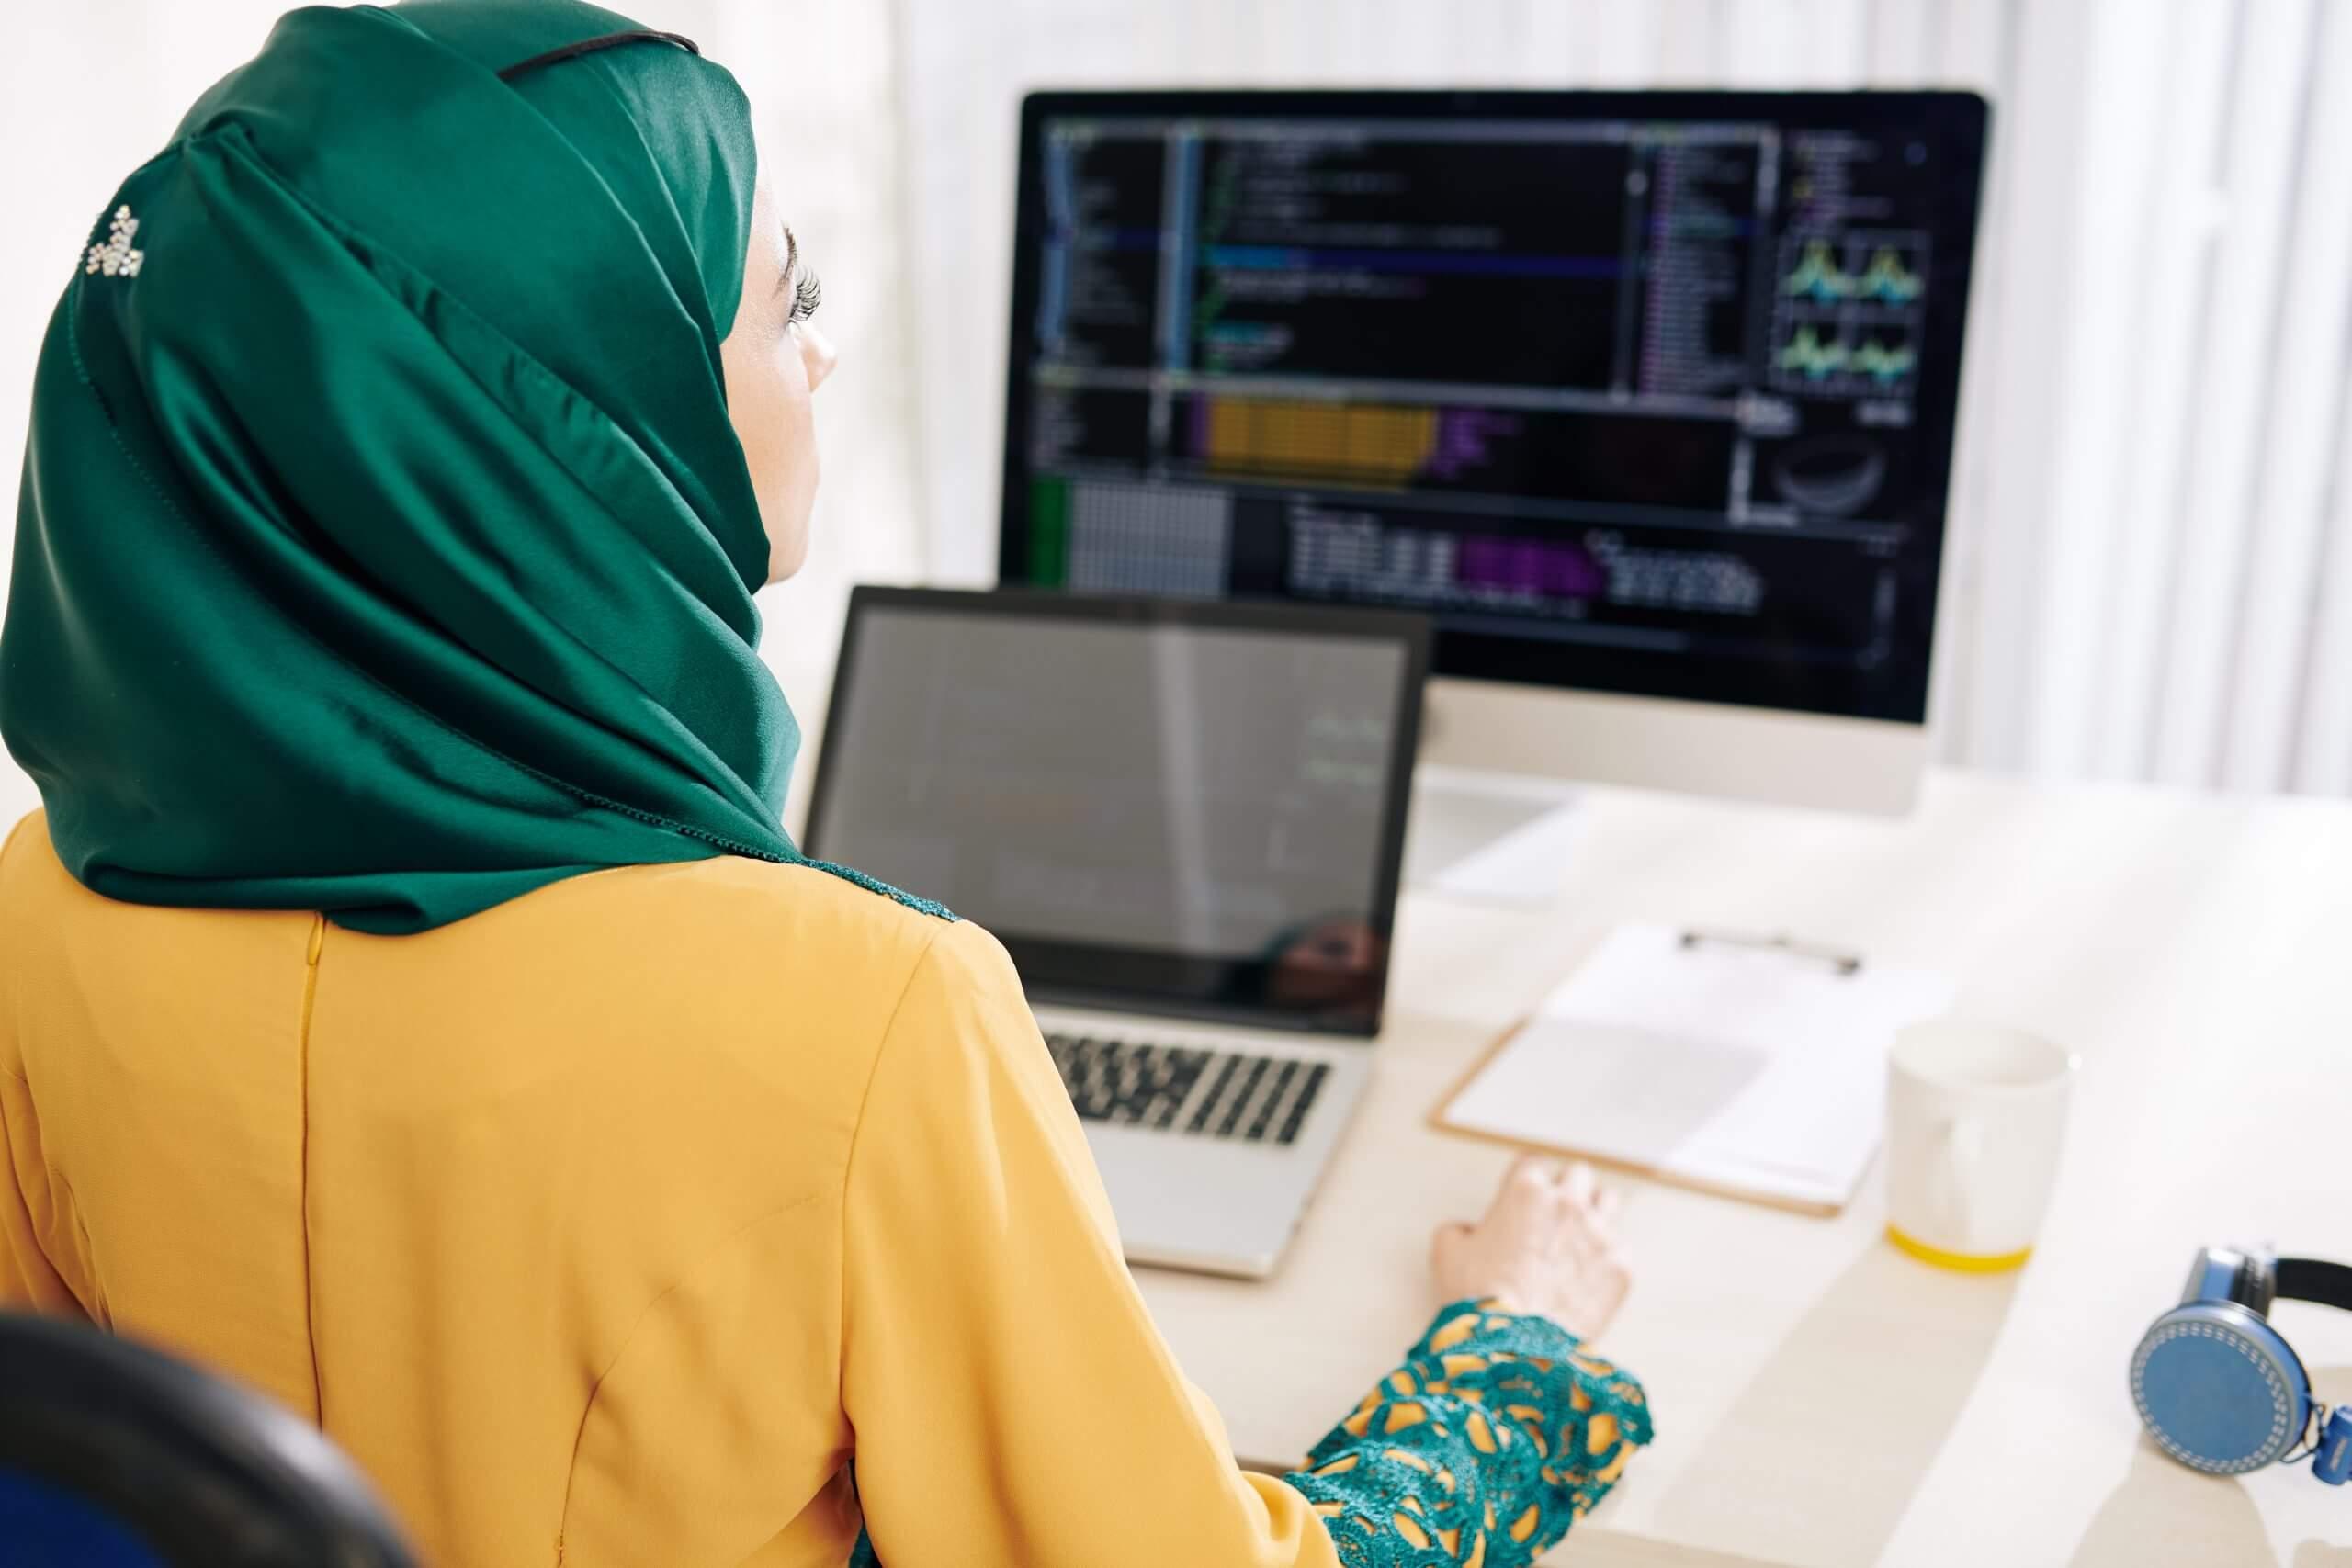 https://technoedgelearning.ca/wp-content/uploads/2020/09/muslim-woman-coding-Y9SE6JS-scaled.jpg